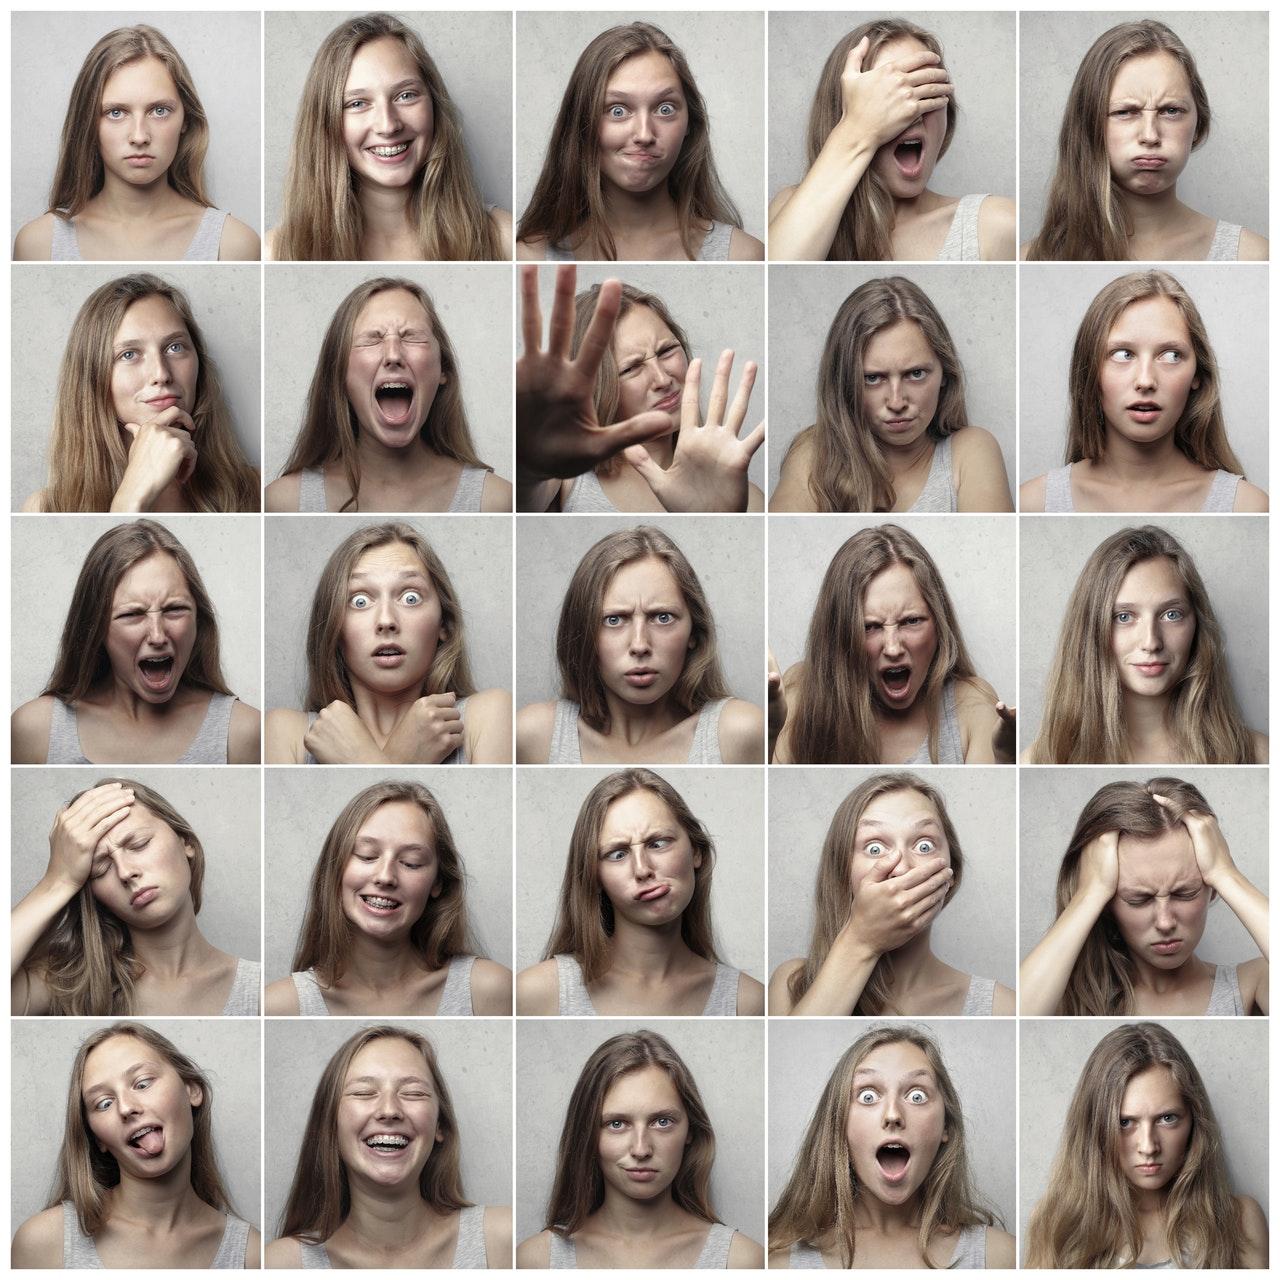 emotion science